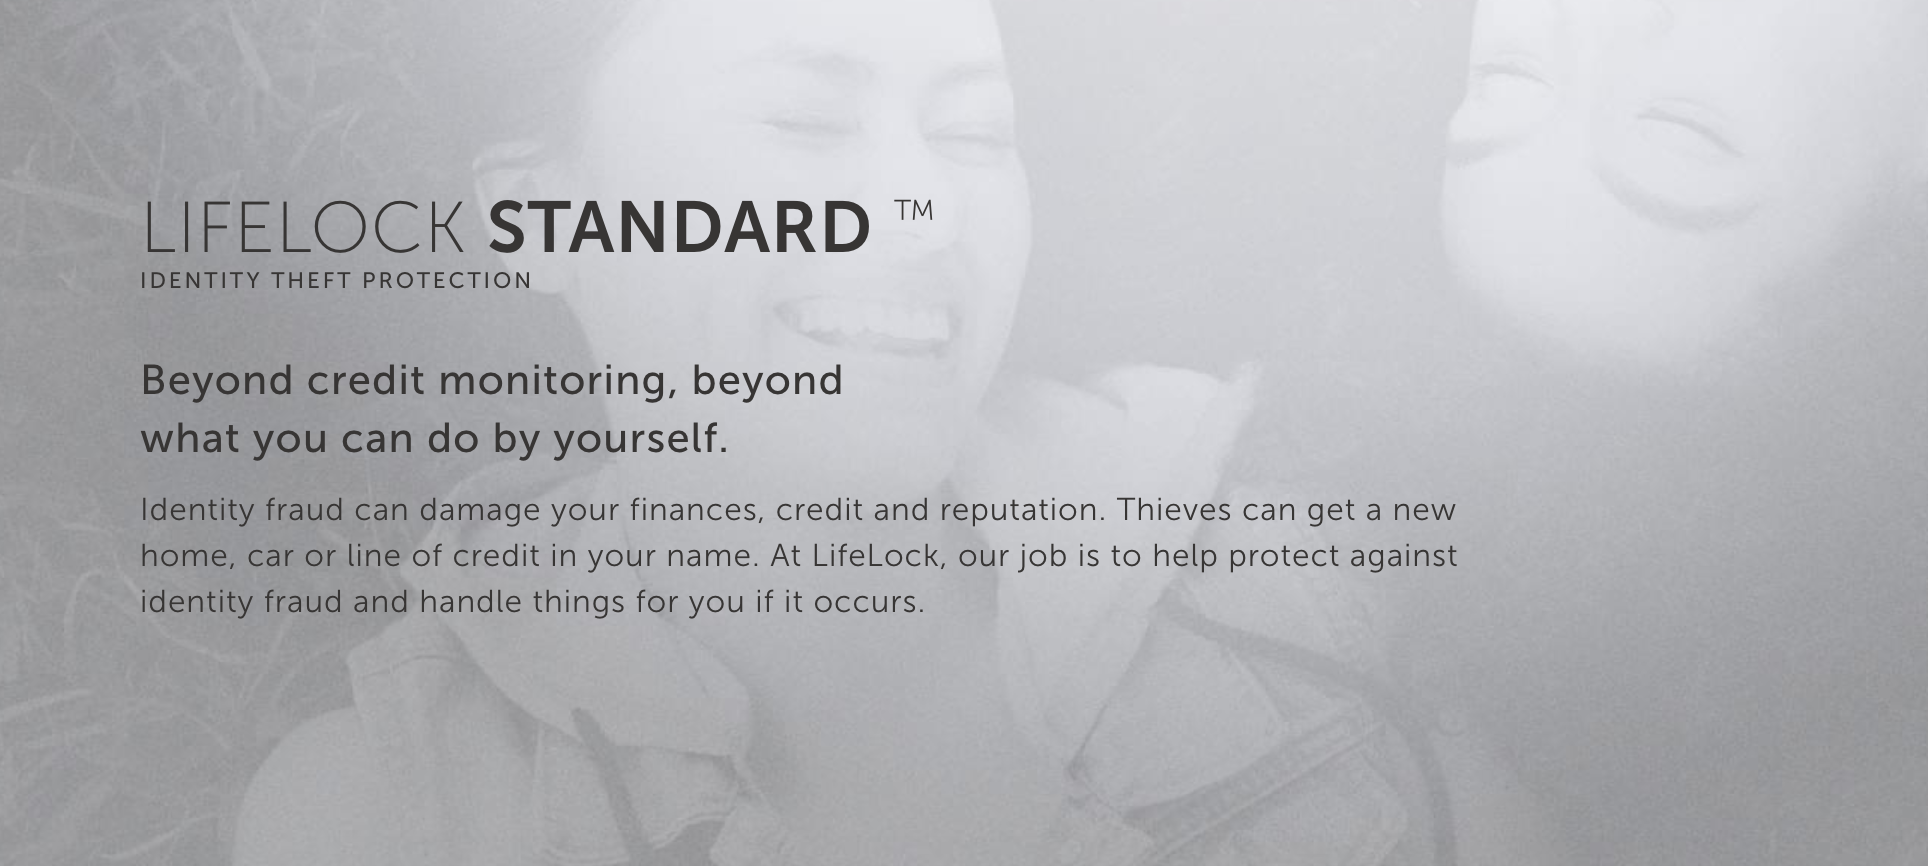 LifeLock Standard